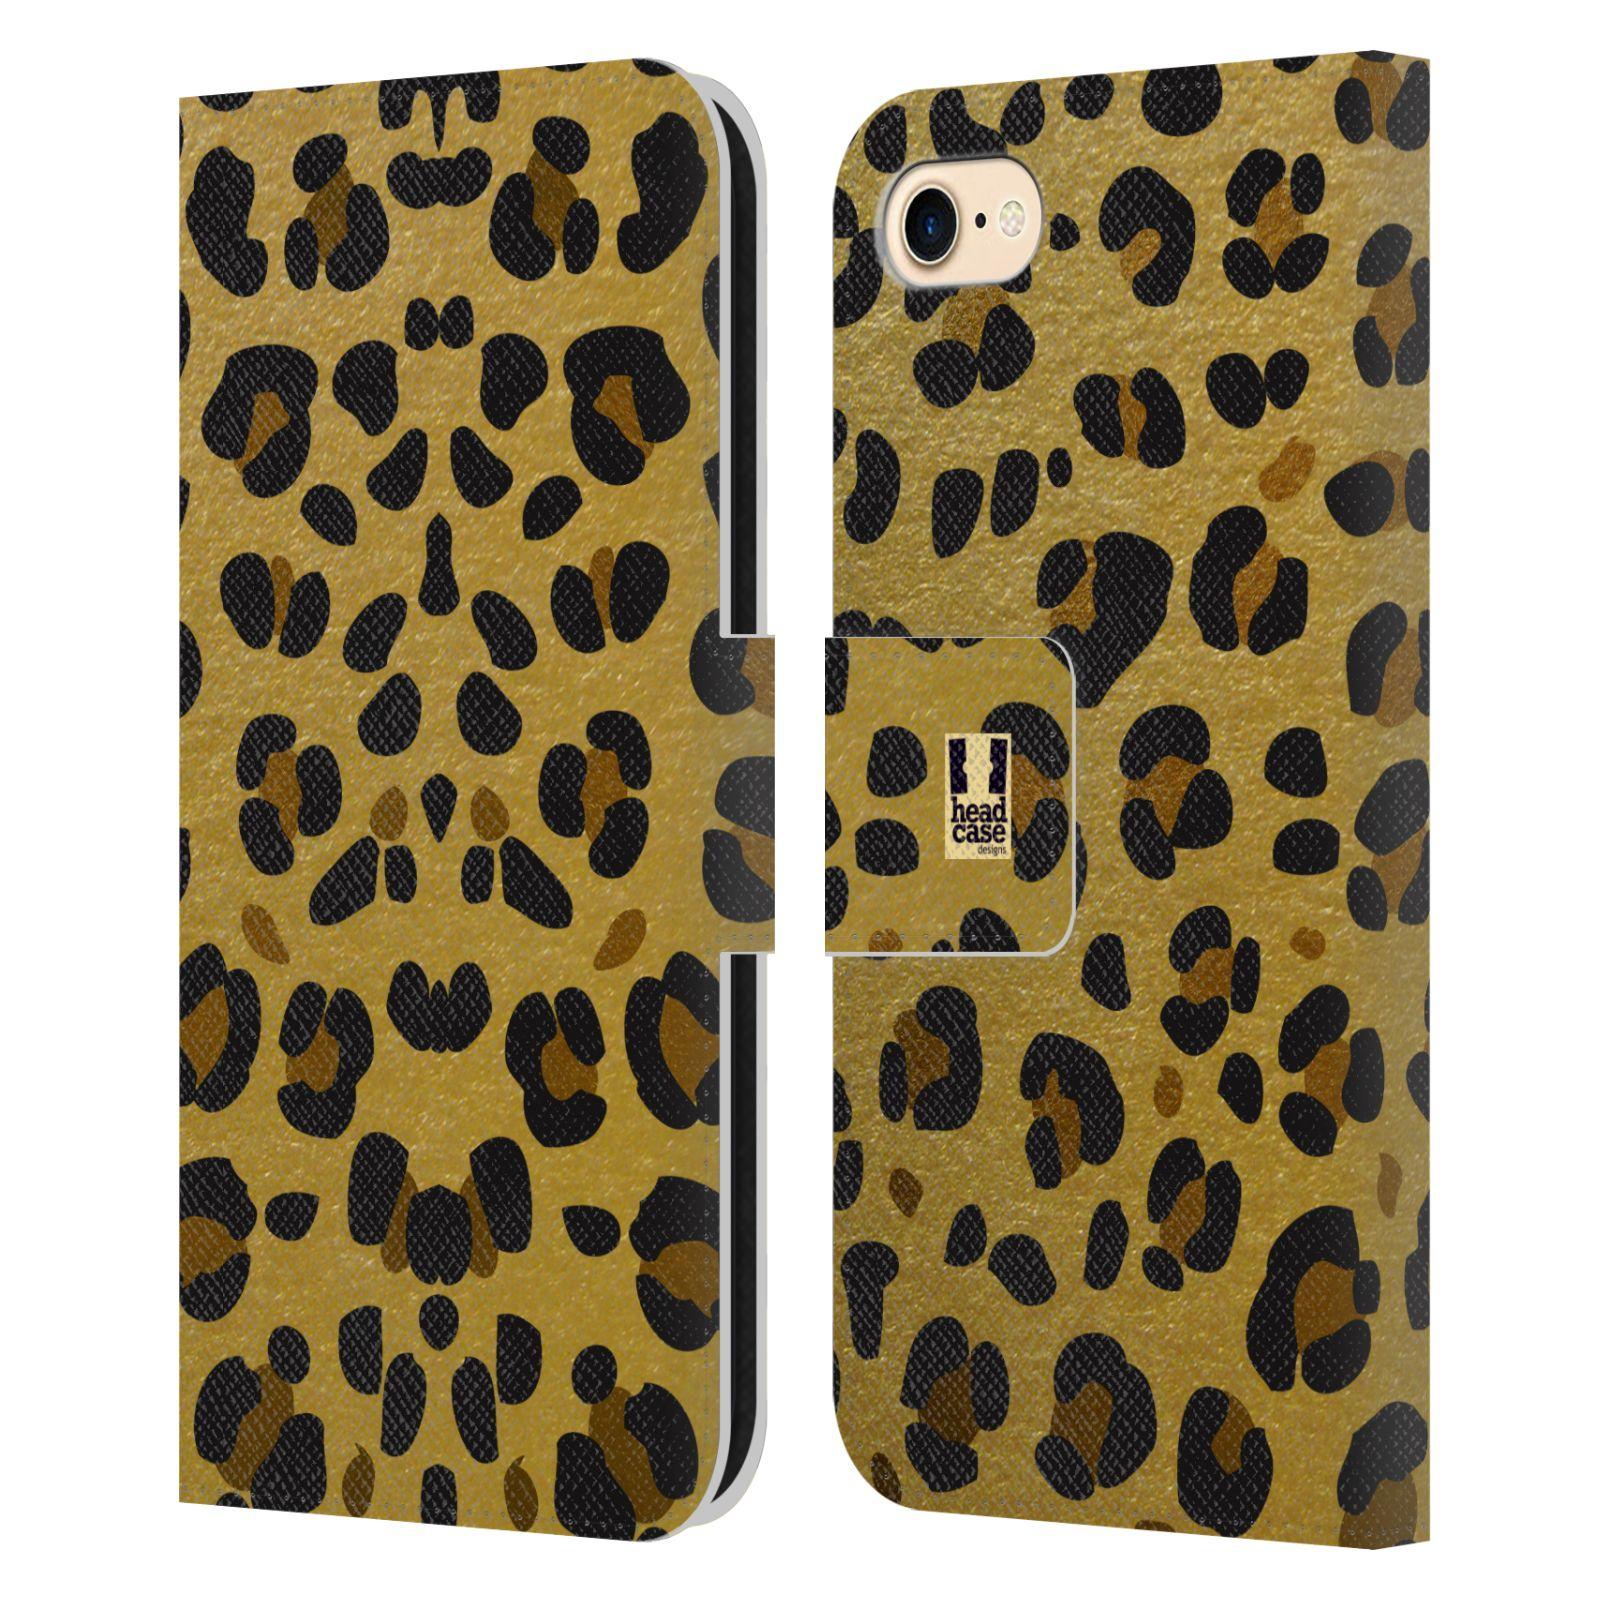 Pouzdro na mobil Apple Iphone 7 / 8 - Head Case - Fashion zvířecí vzor